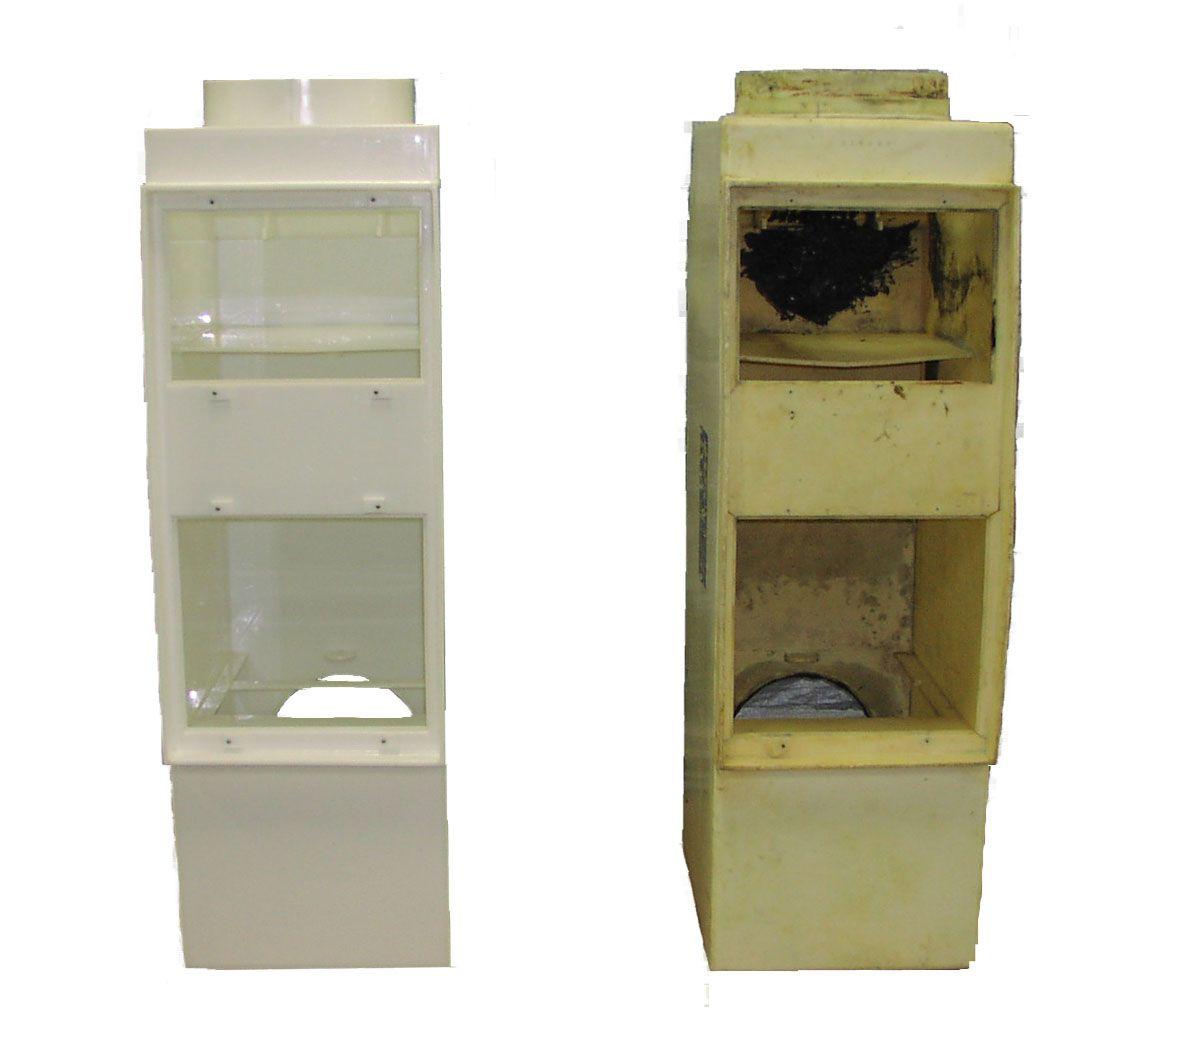 Polyethylene evaporator unit